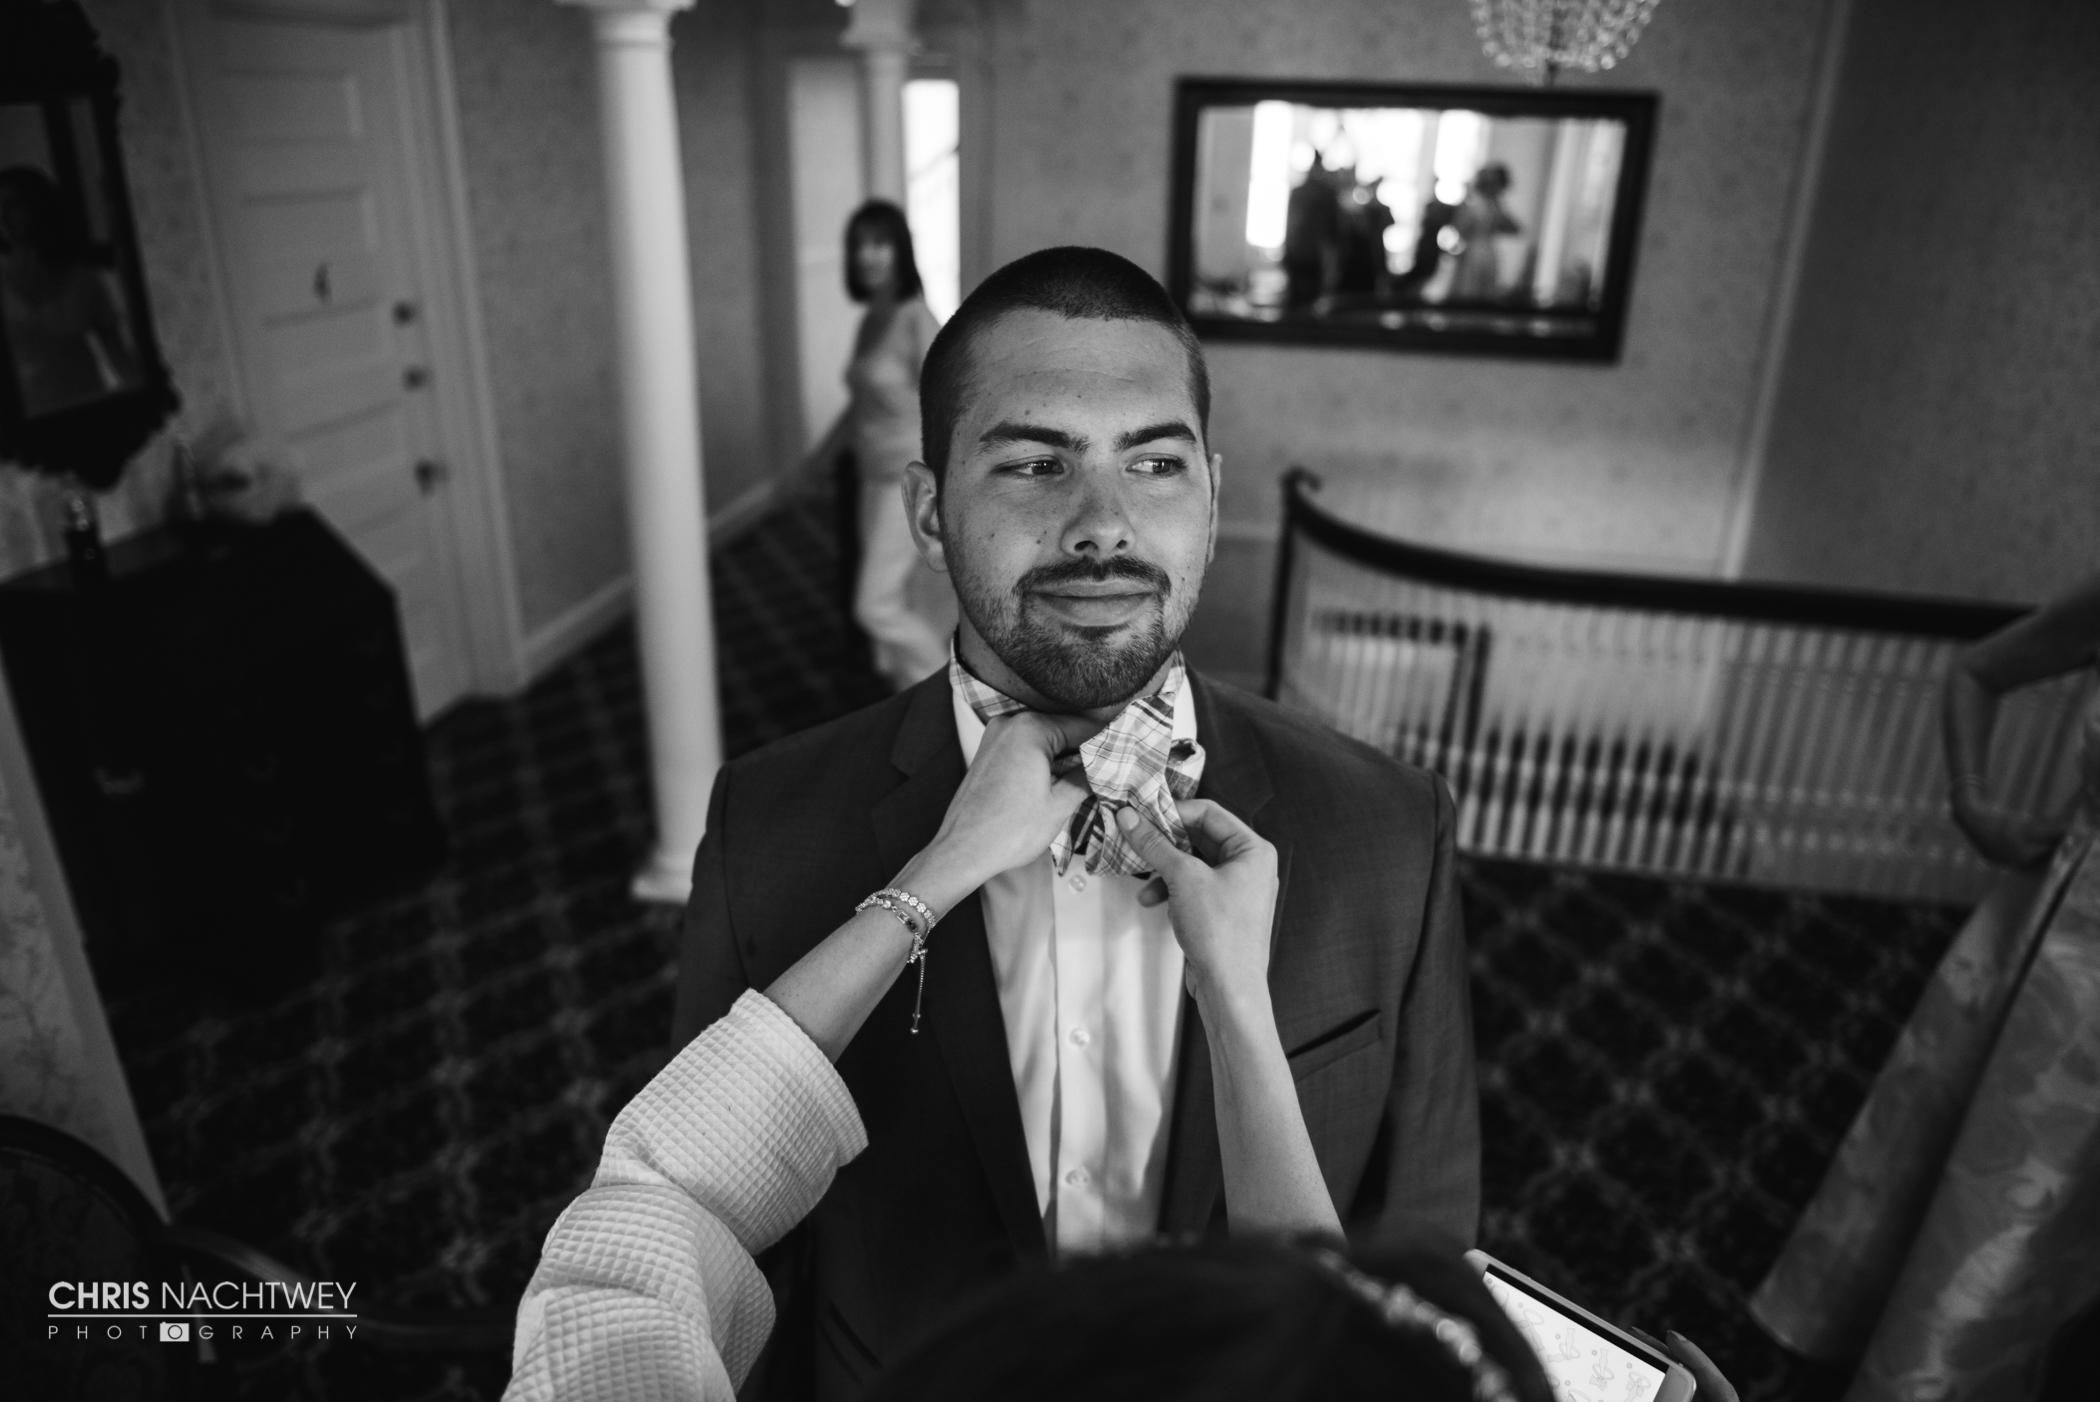 inn-at-mystic-connecticut-wedding-photographer-chris-nachtwey-2.jpg